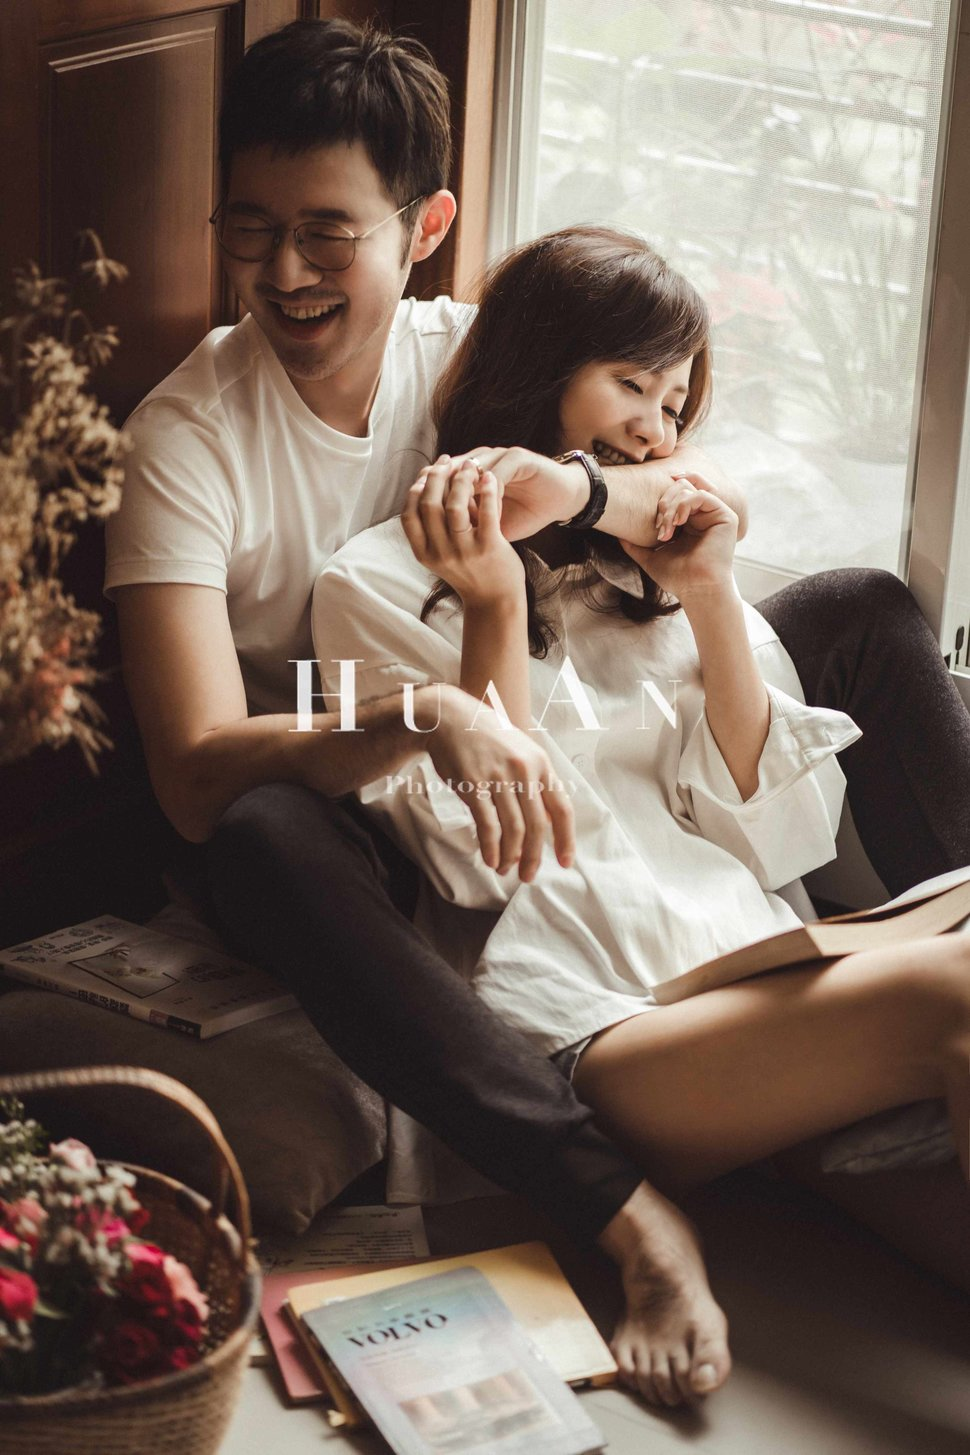 DSC01453 - Huaan Photography《結婚吧》